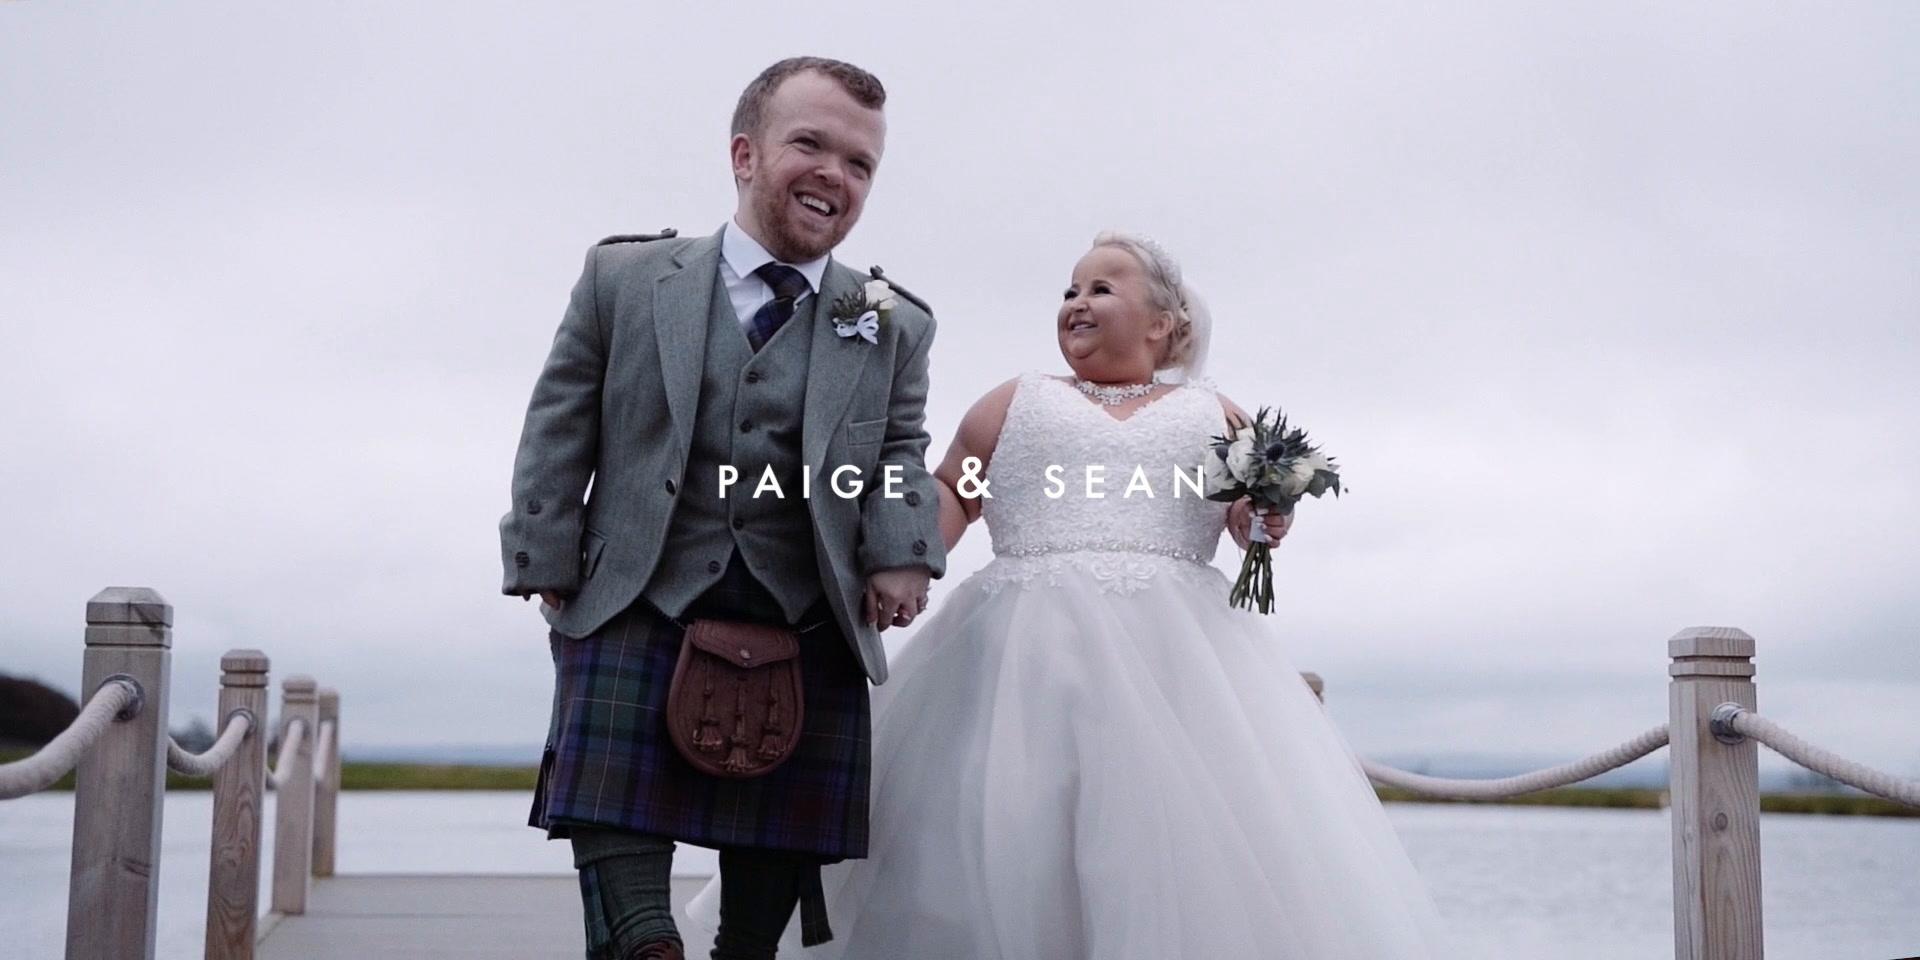 Paige Stevenson + Sean Reid | Bathgate, United Kingdom | The Vu